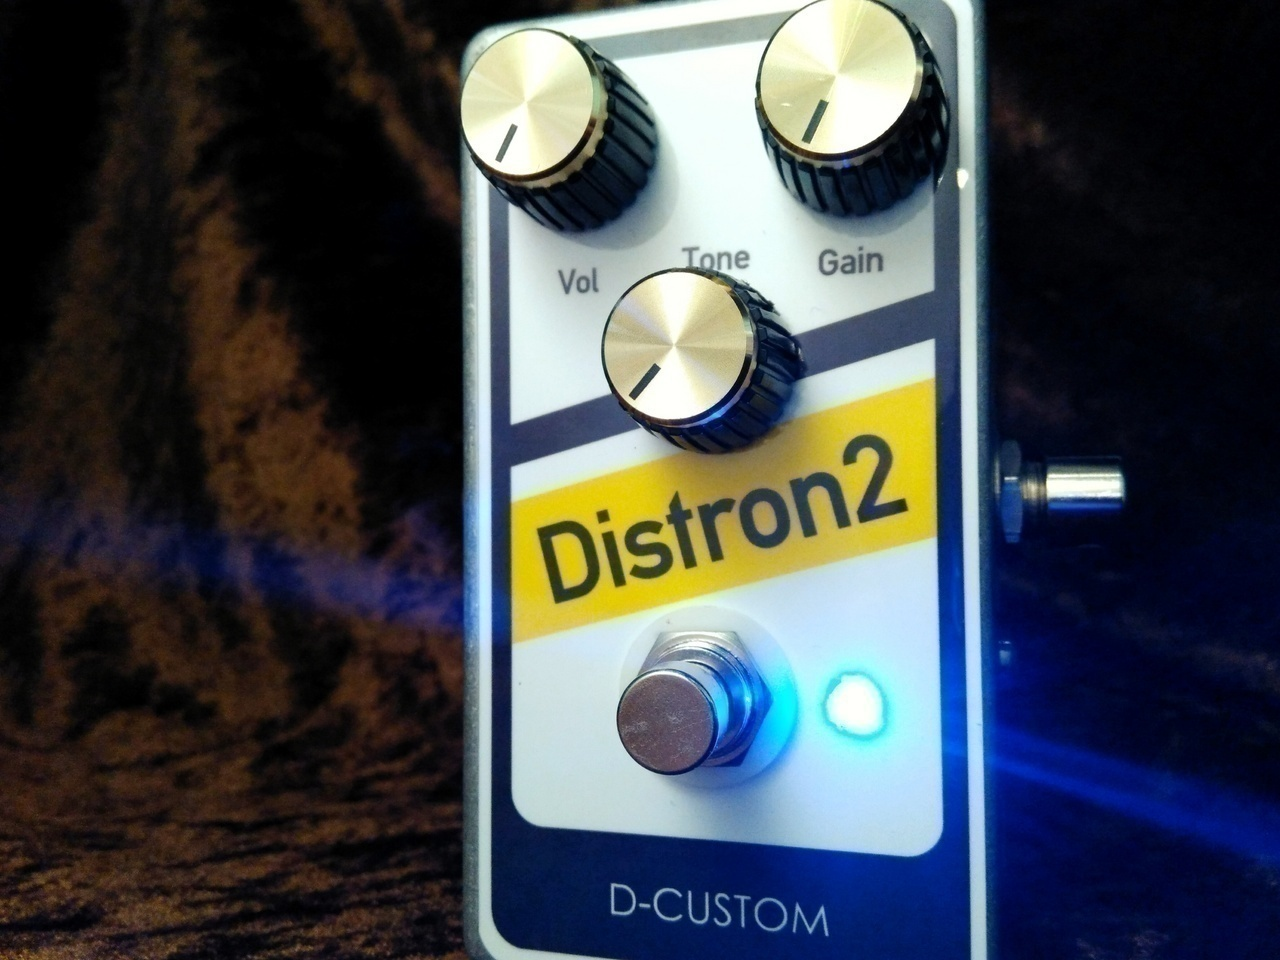 D-CUSTOM Distron2 [店頭展示品につき、1台限定の特別価格!] ☆12/25 20:30まで!☆